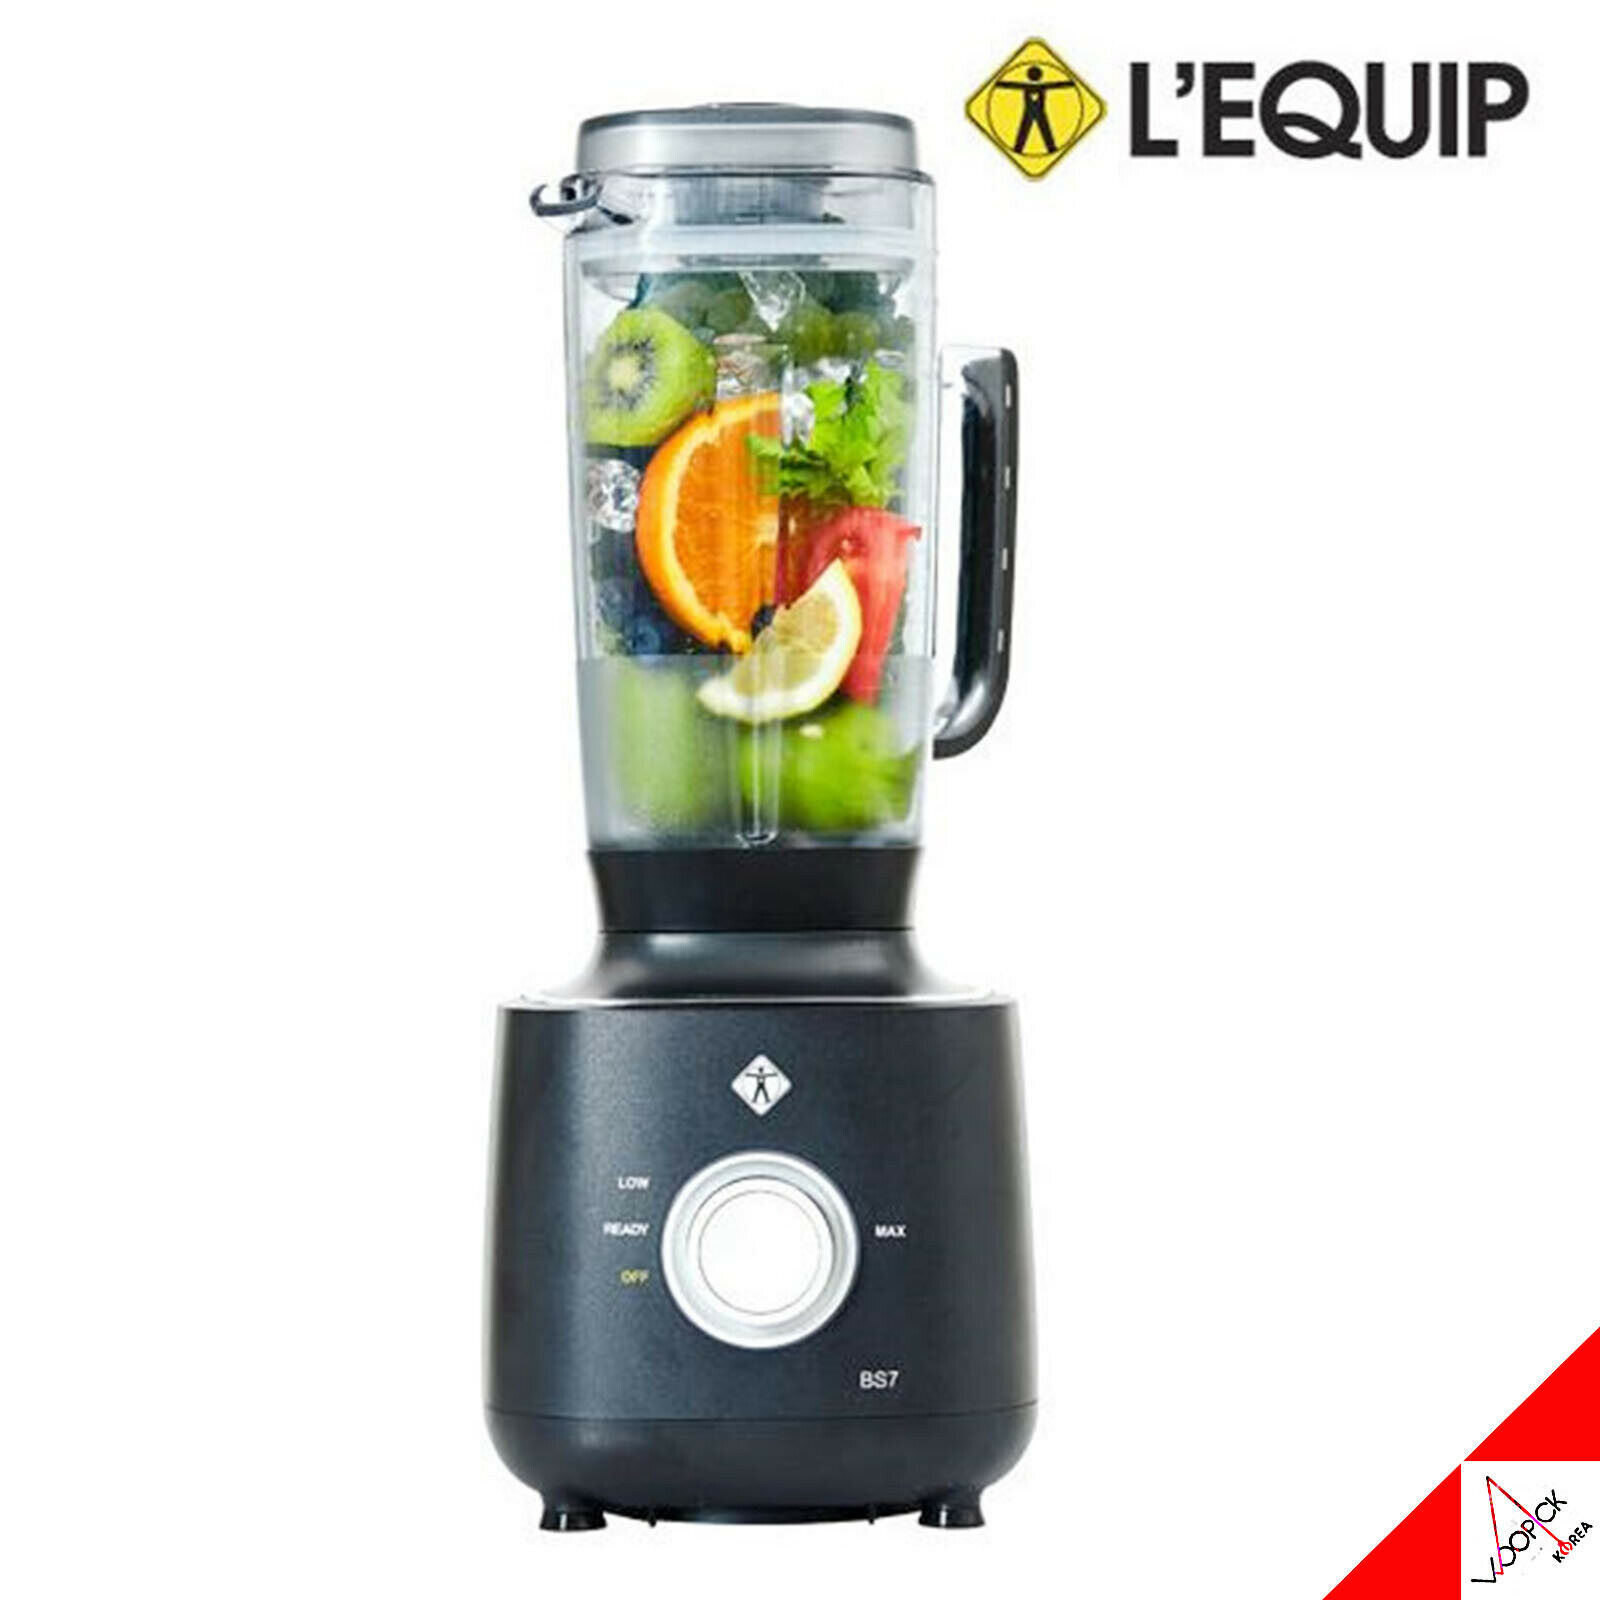 LEQUIP RPM Quattro BS7 Blender Mixeur broyeur centrifugeuse - 33000 tr min, 4.6HP, 2 L, 220 V, noir